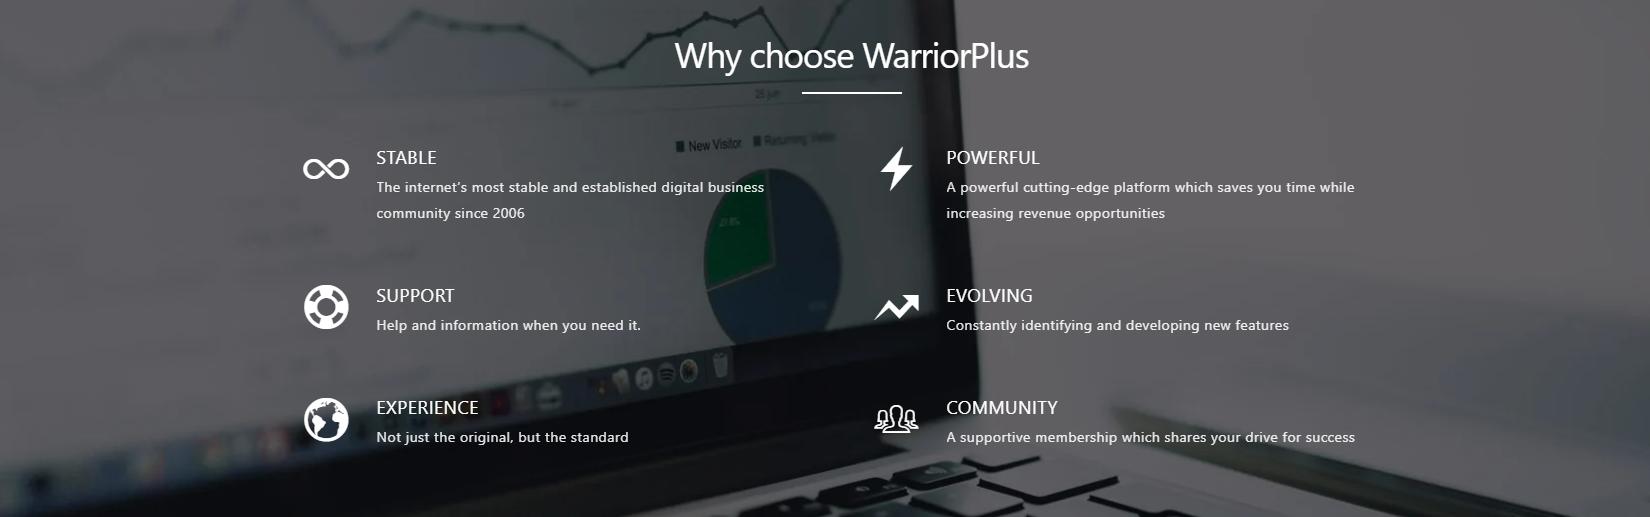 warrior plus benefits